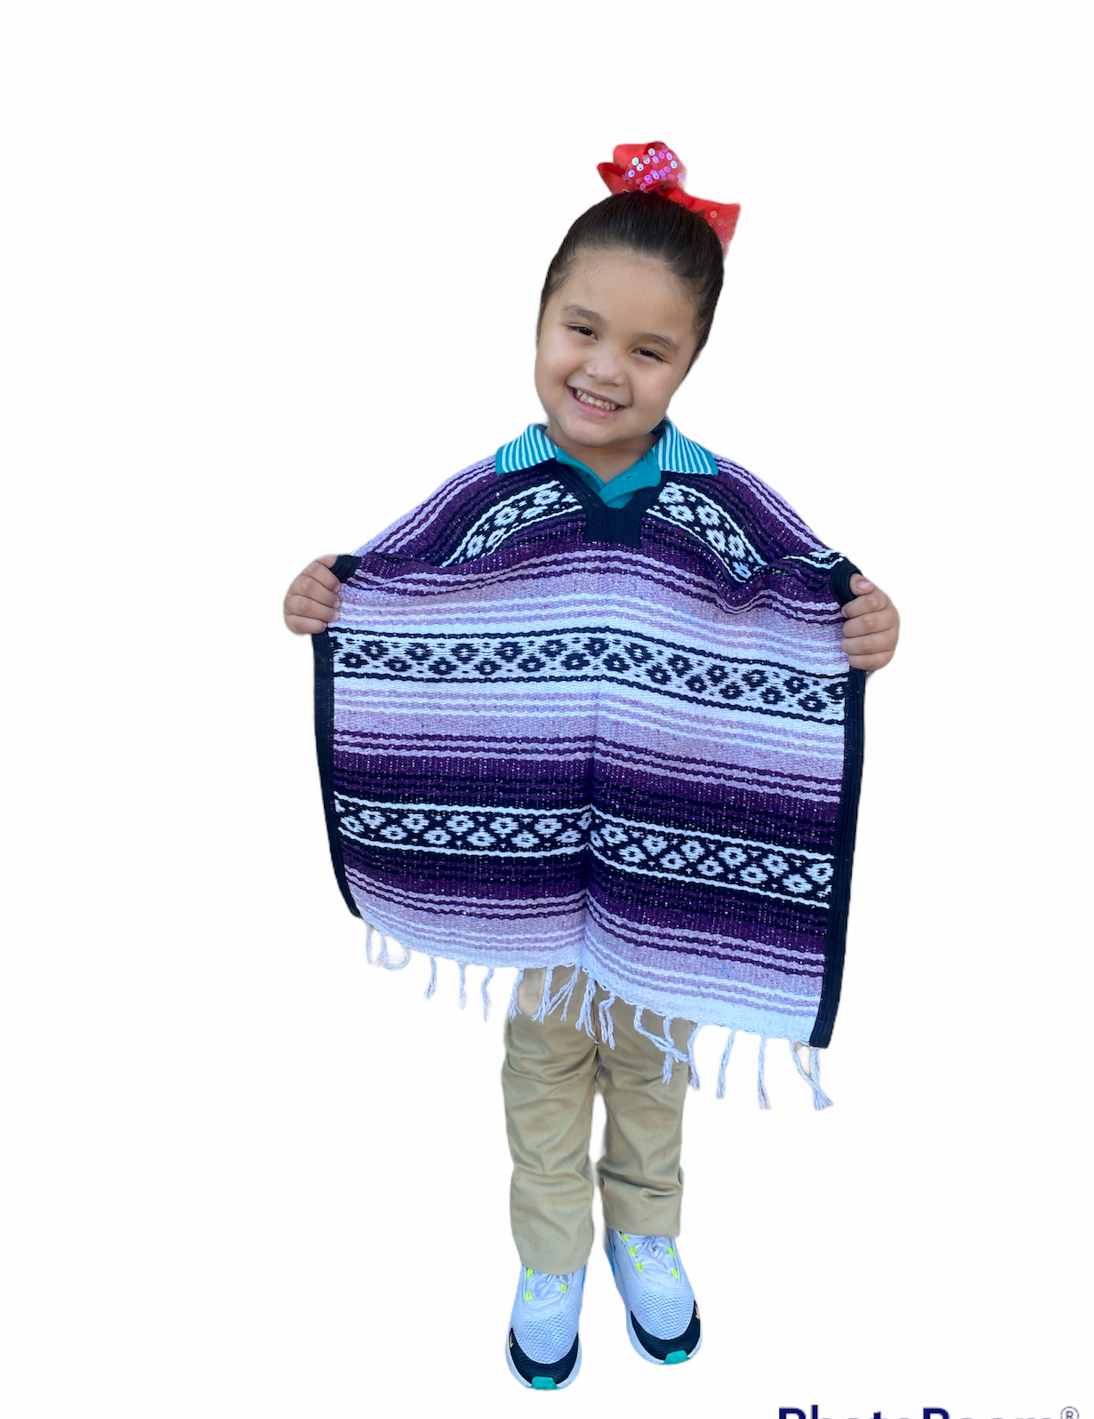 MEXICAN KIDS PONCHO , FALSA , COSTUME ,BLANKET SERAPE GABAN ,KIDS 5 - 9 ,PURPLE